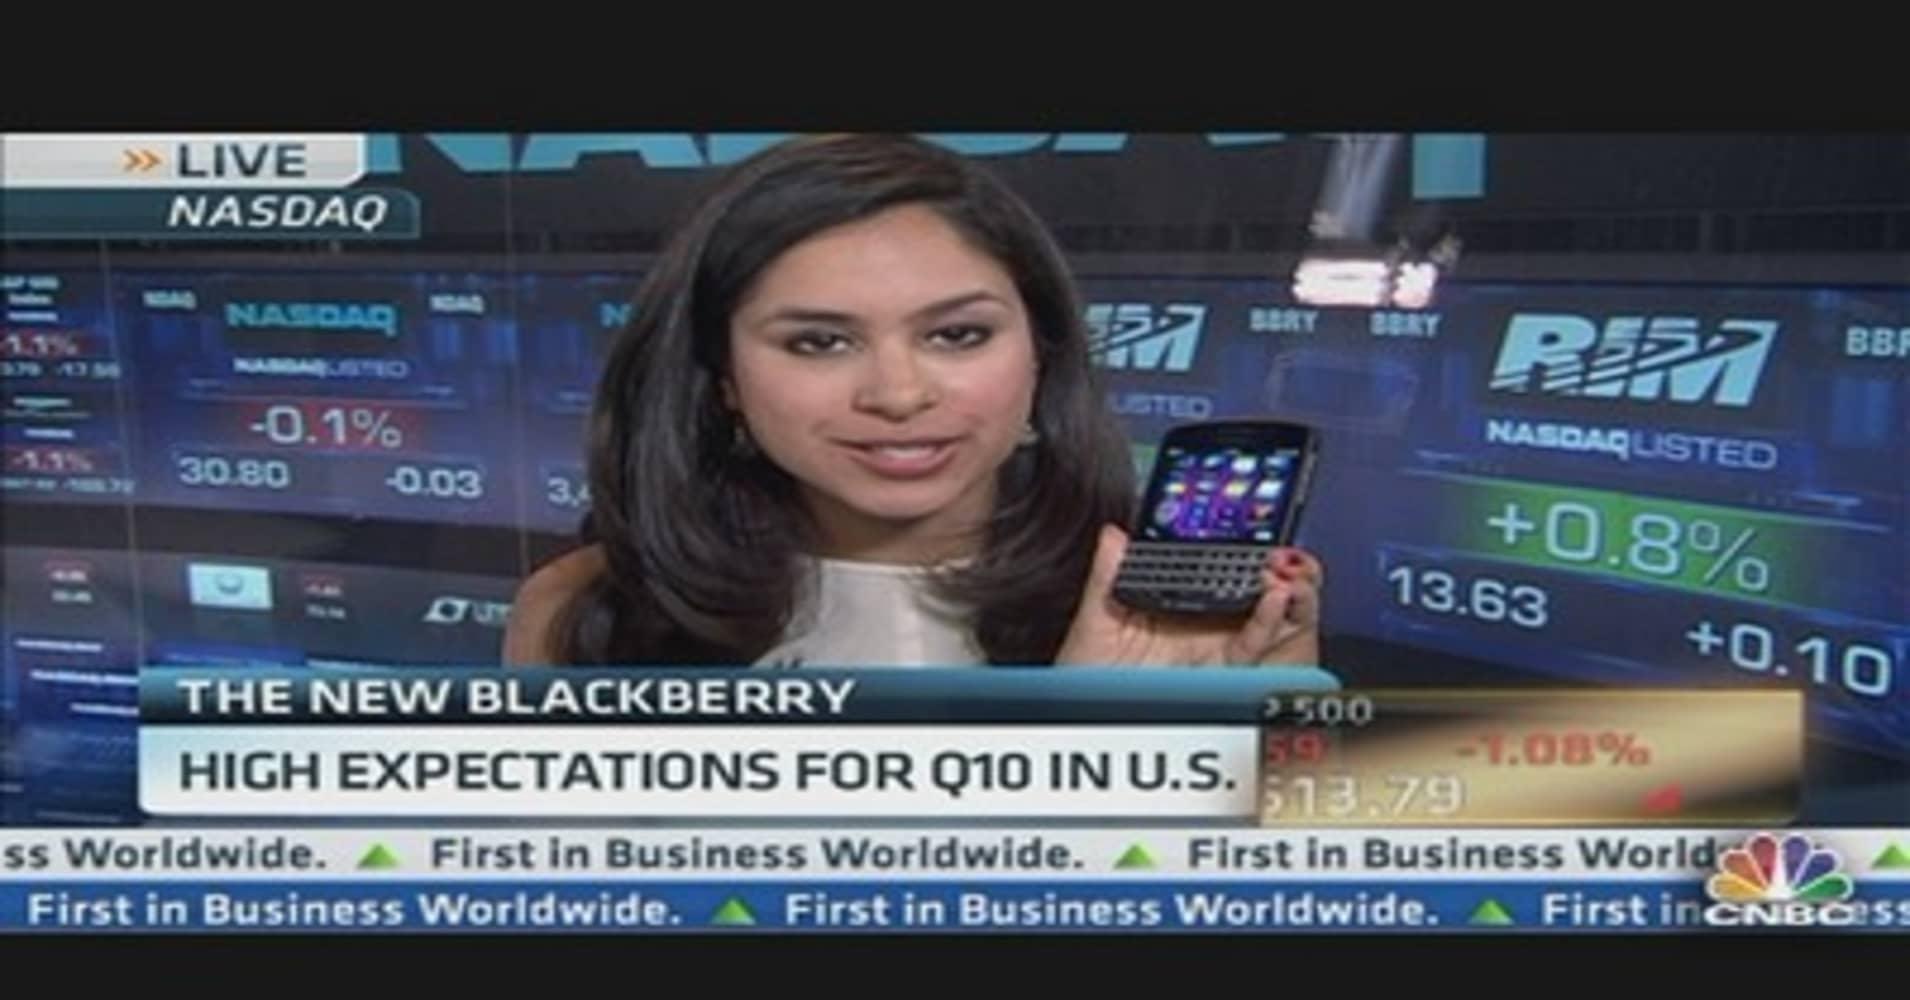 BlackBerry to Launch Q10 Tomorrow